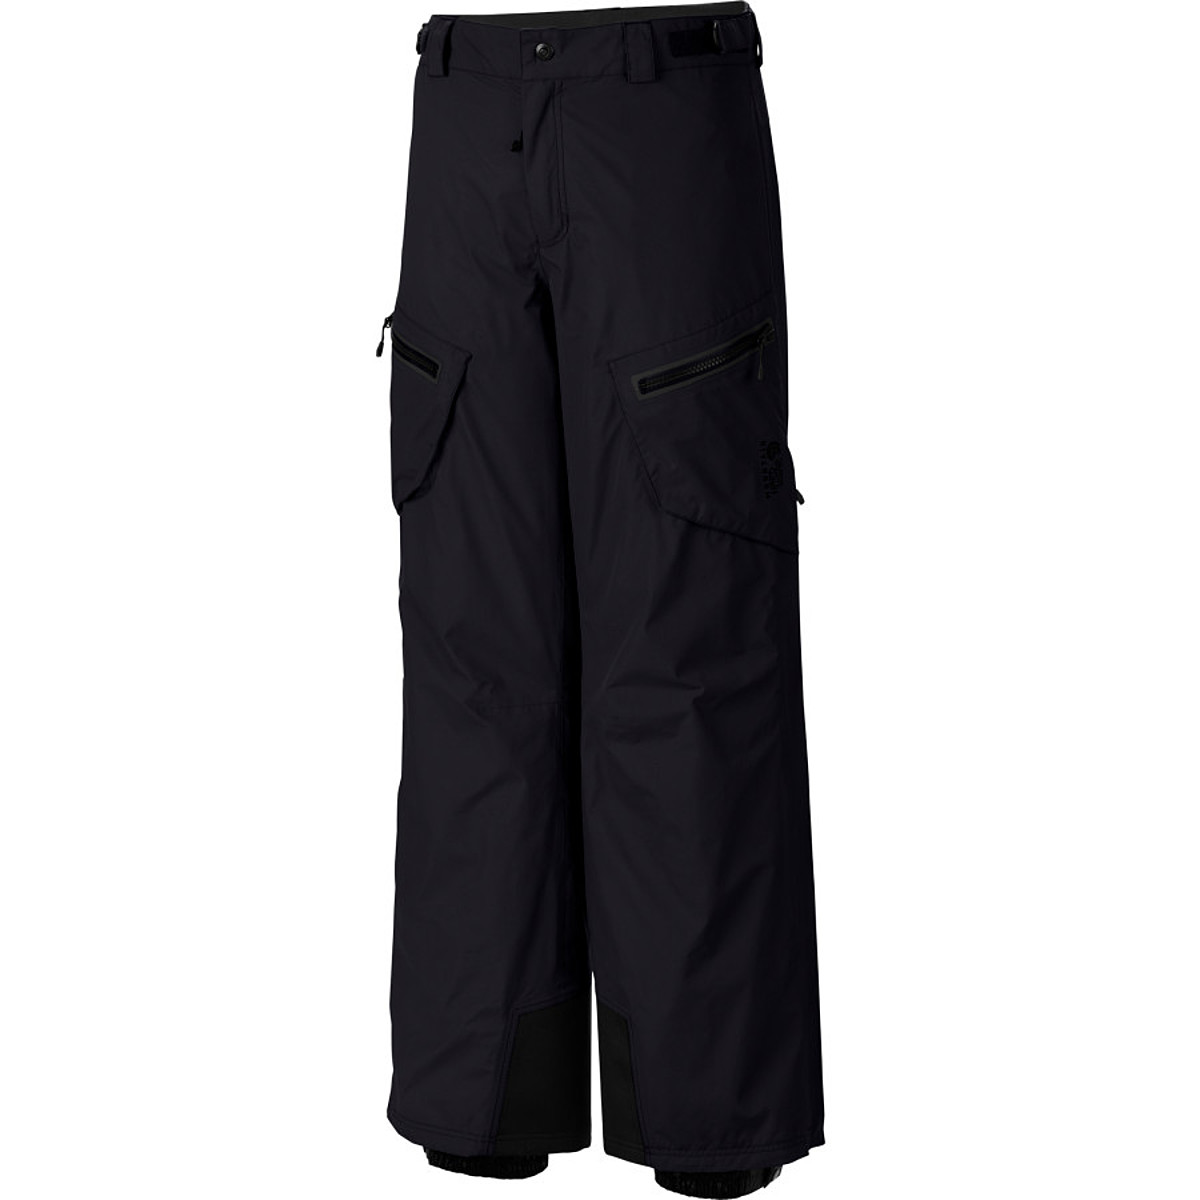 Mountain Hardwear Compulsion 2L Pant